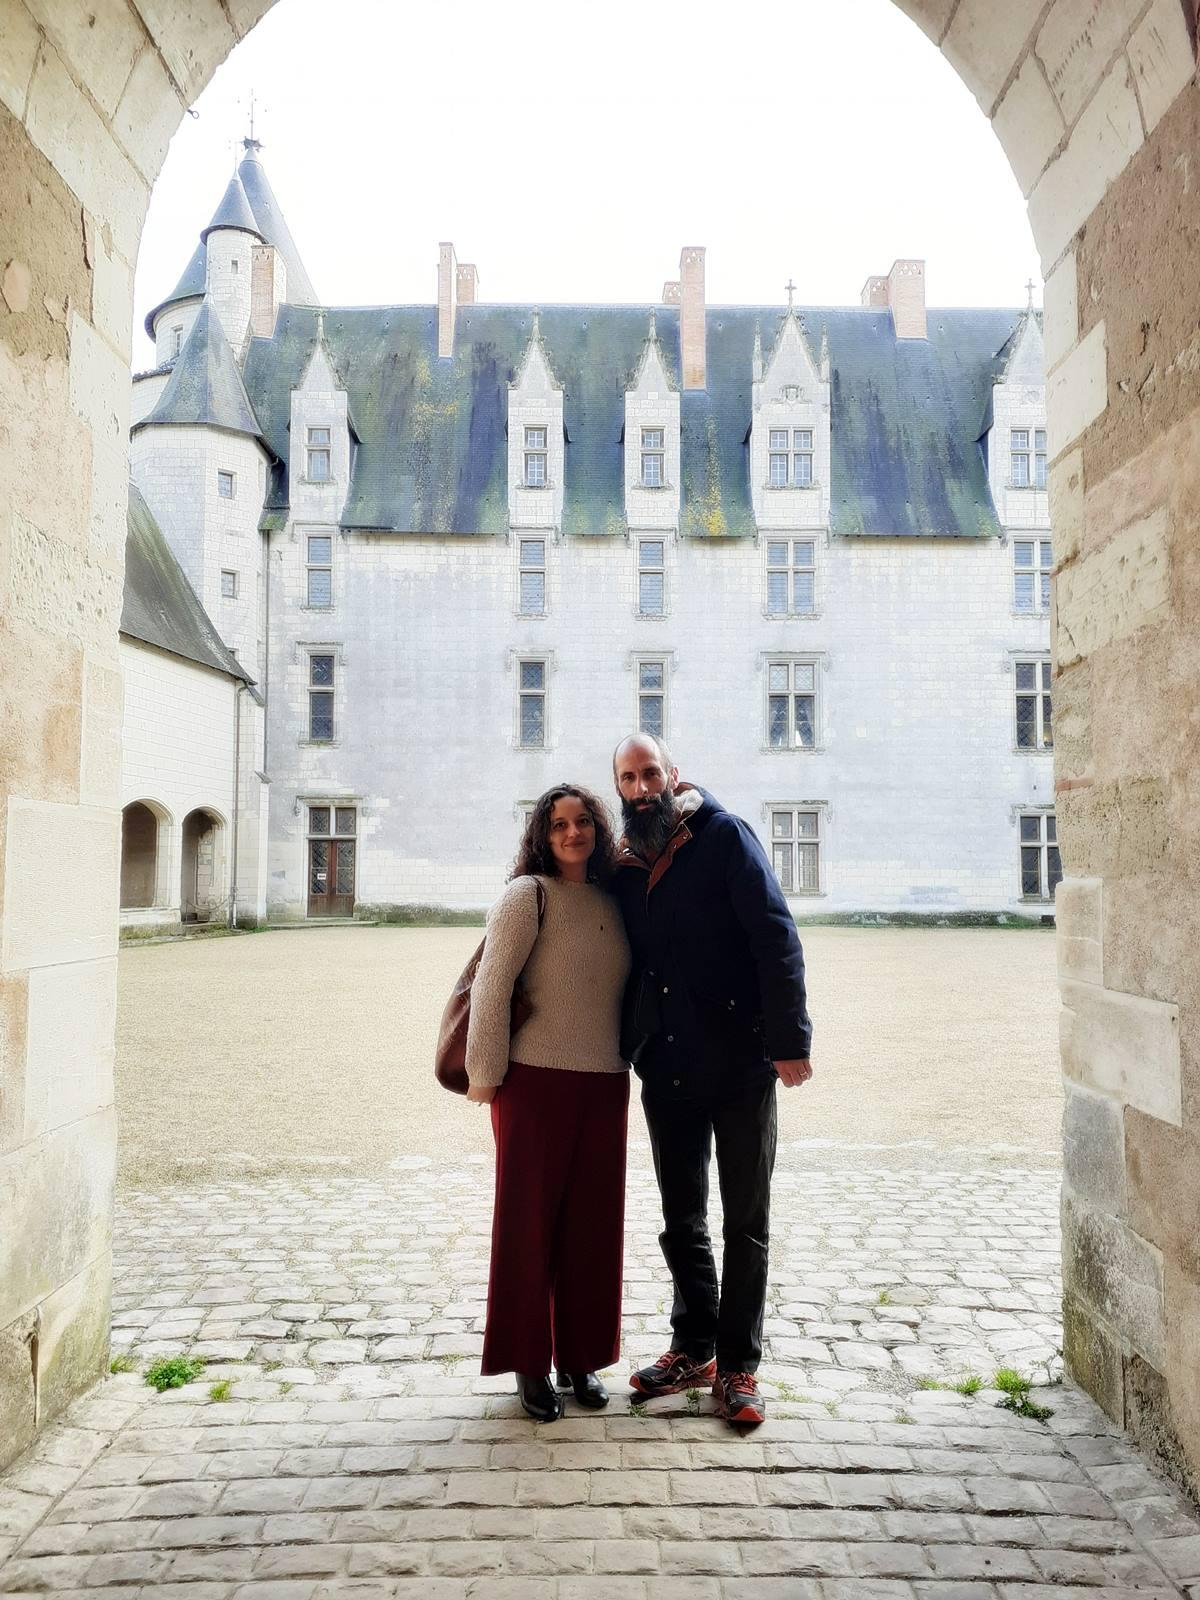 Chateau plessis bourre maine loire tourisme20200222 164653